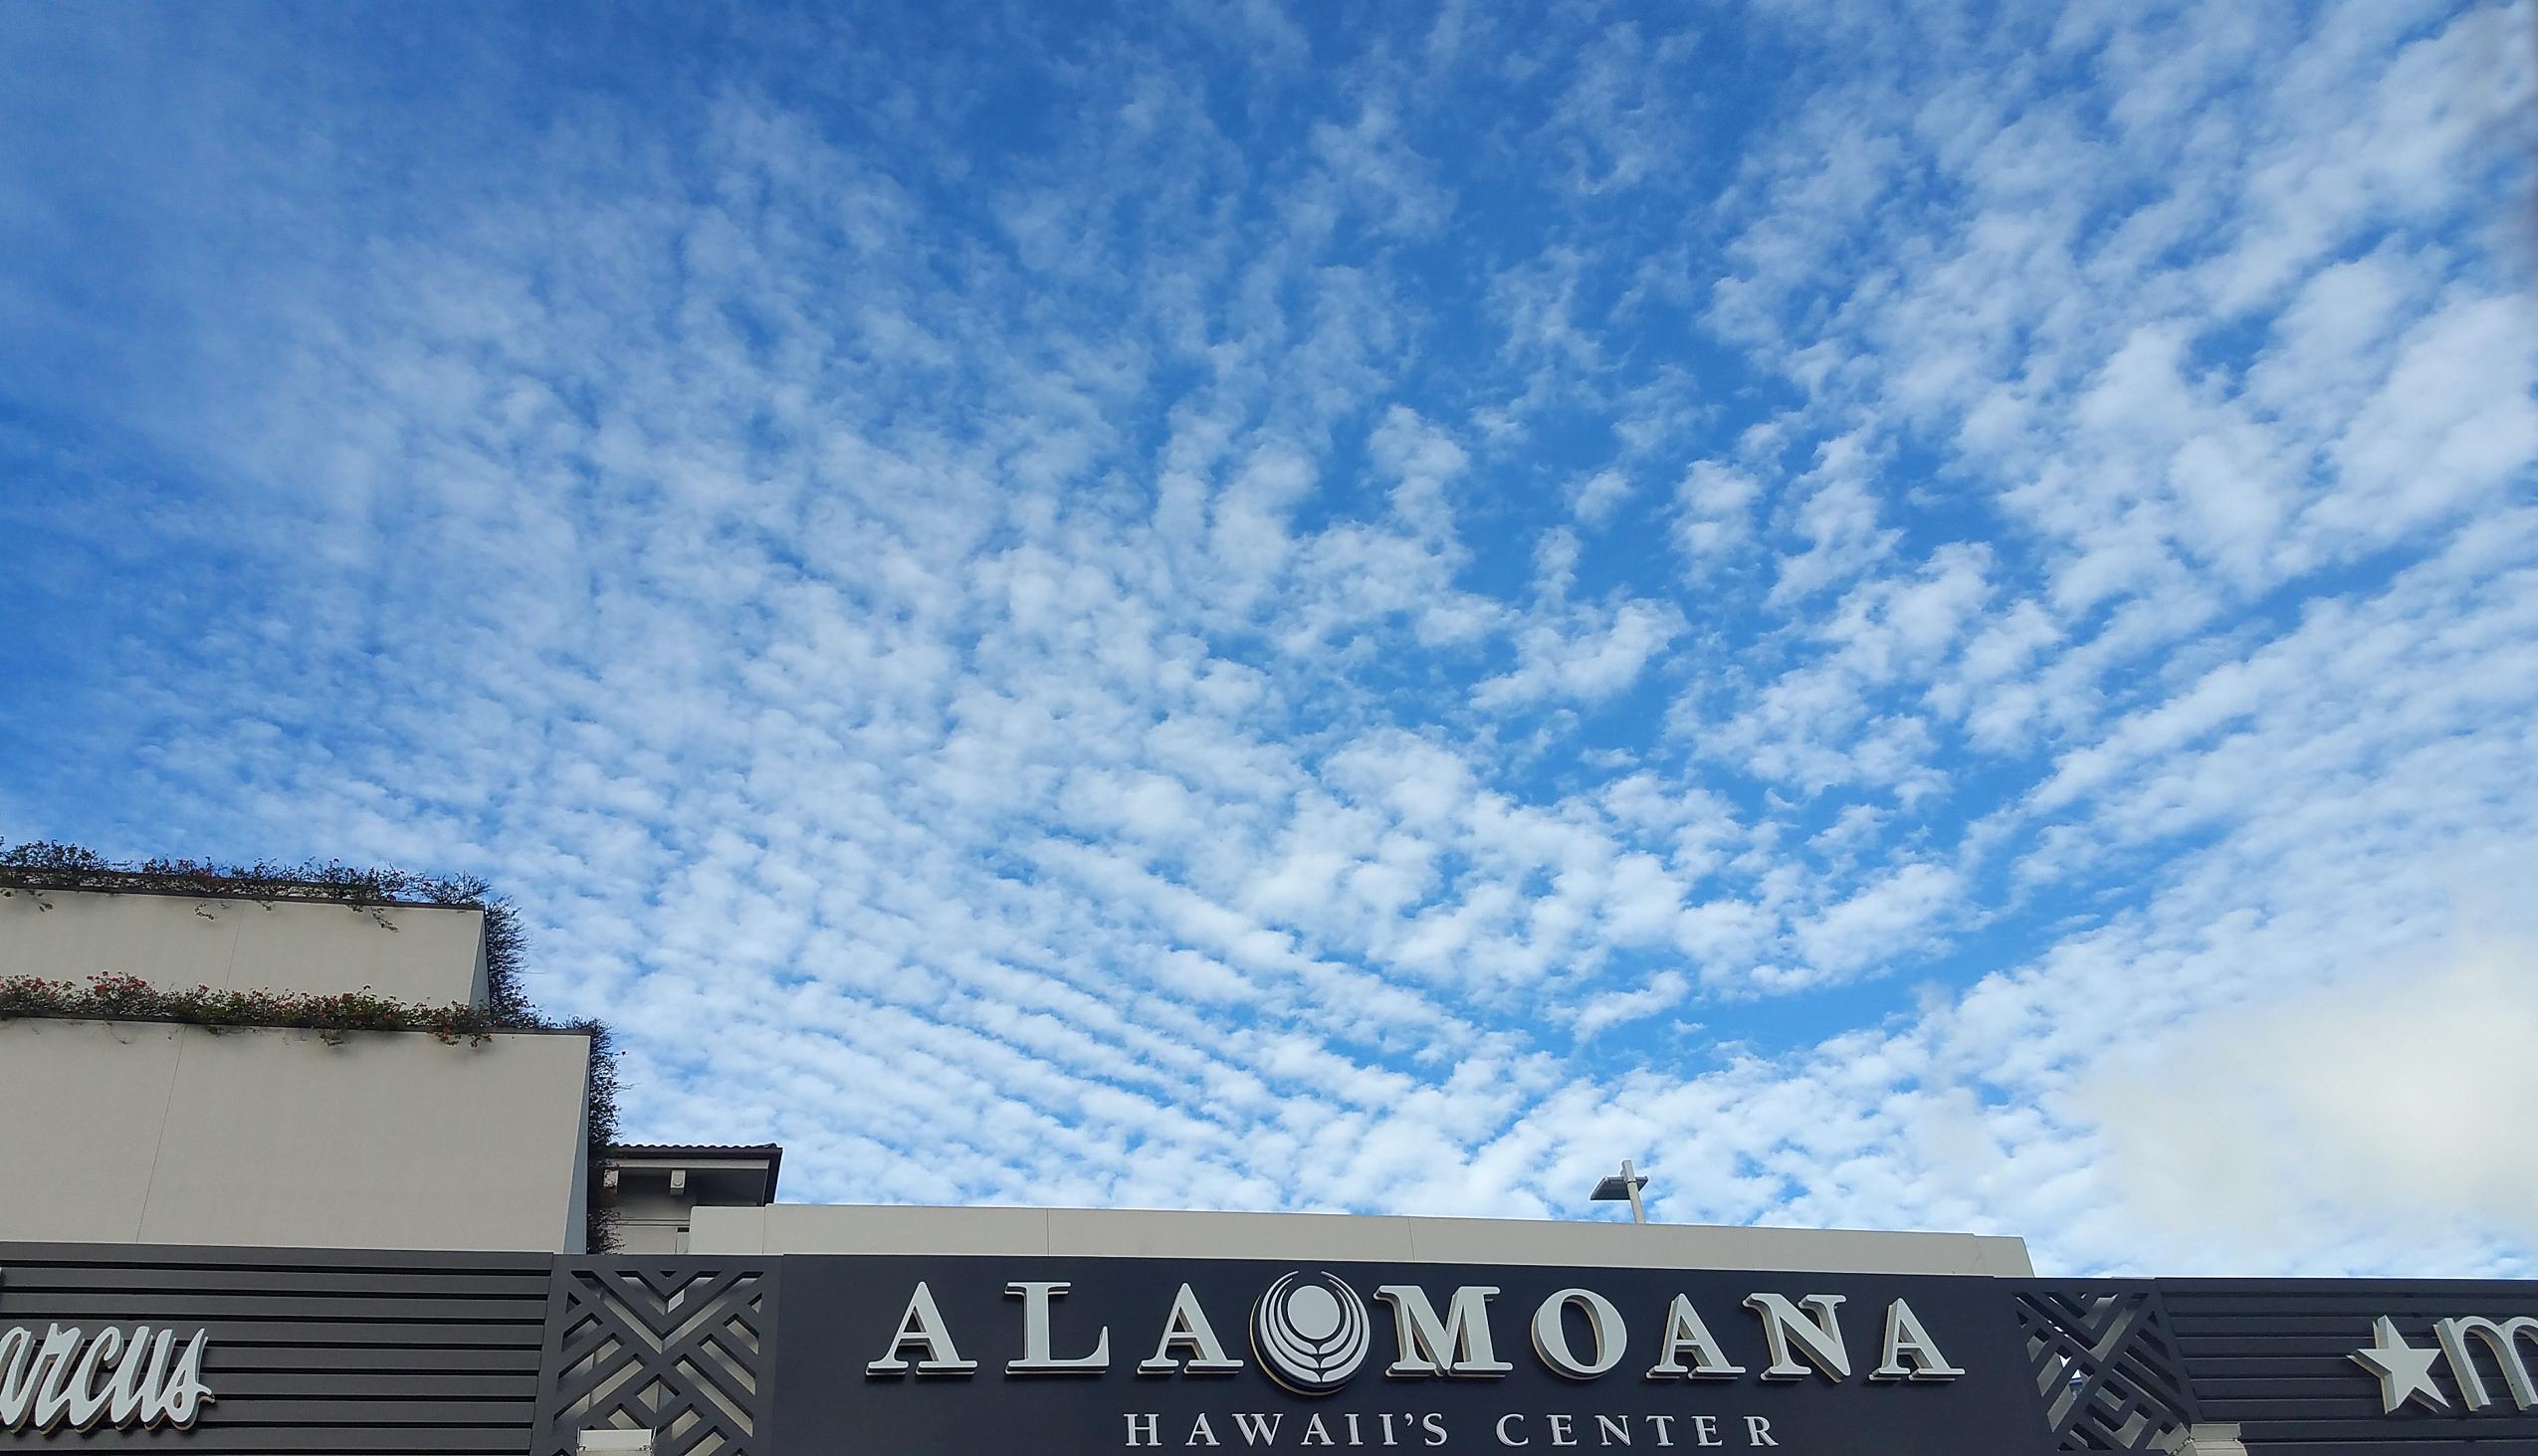 Ala Moana Beach Park Closed